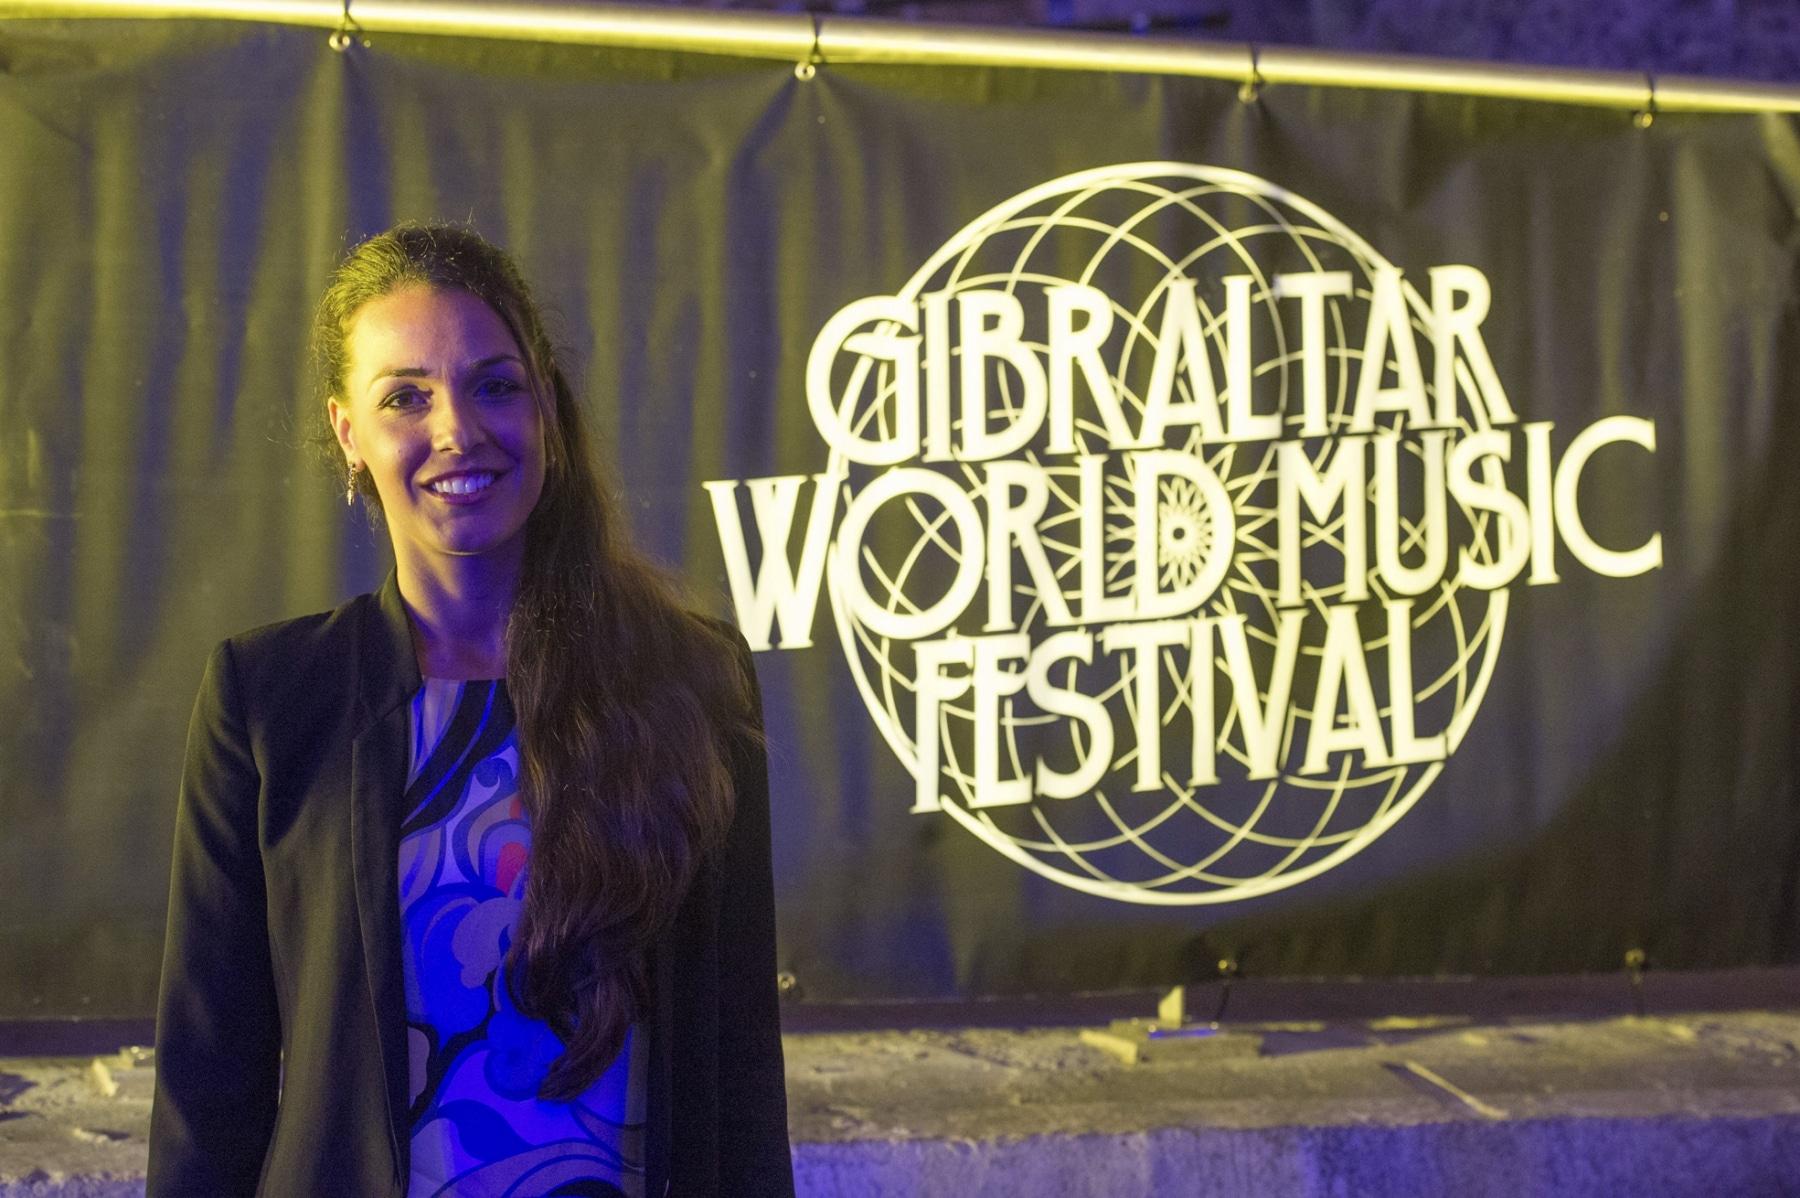 19-junio-gibraltar-world-music-festival29_14461189771_o